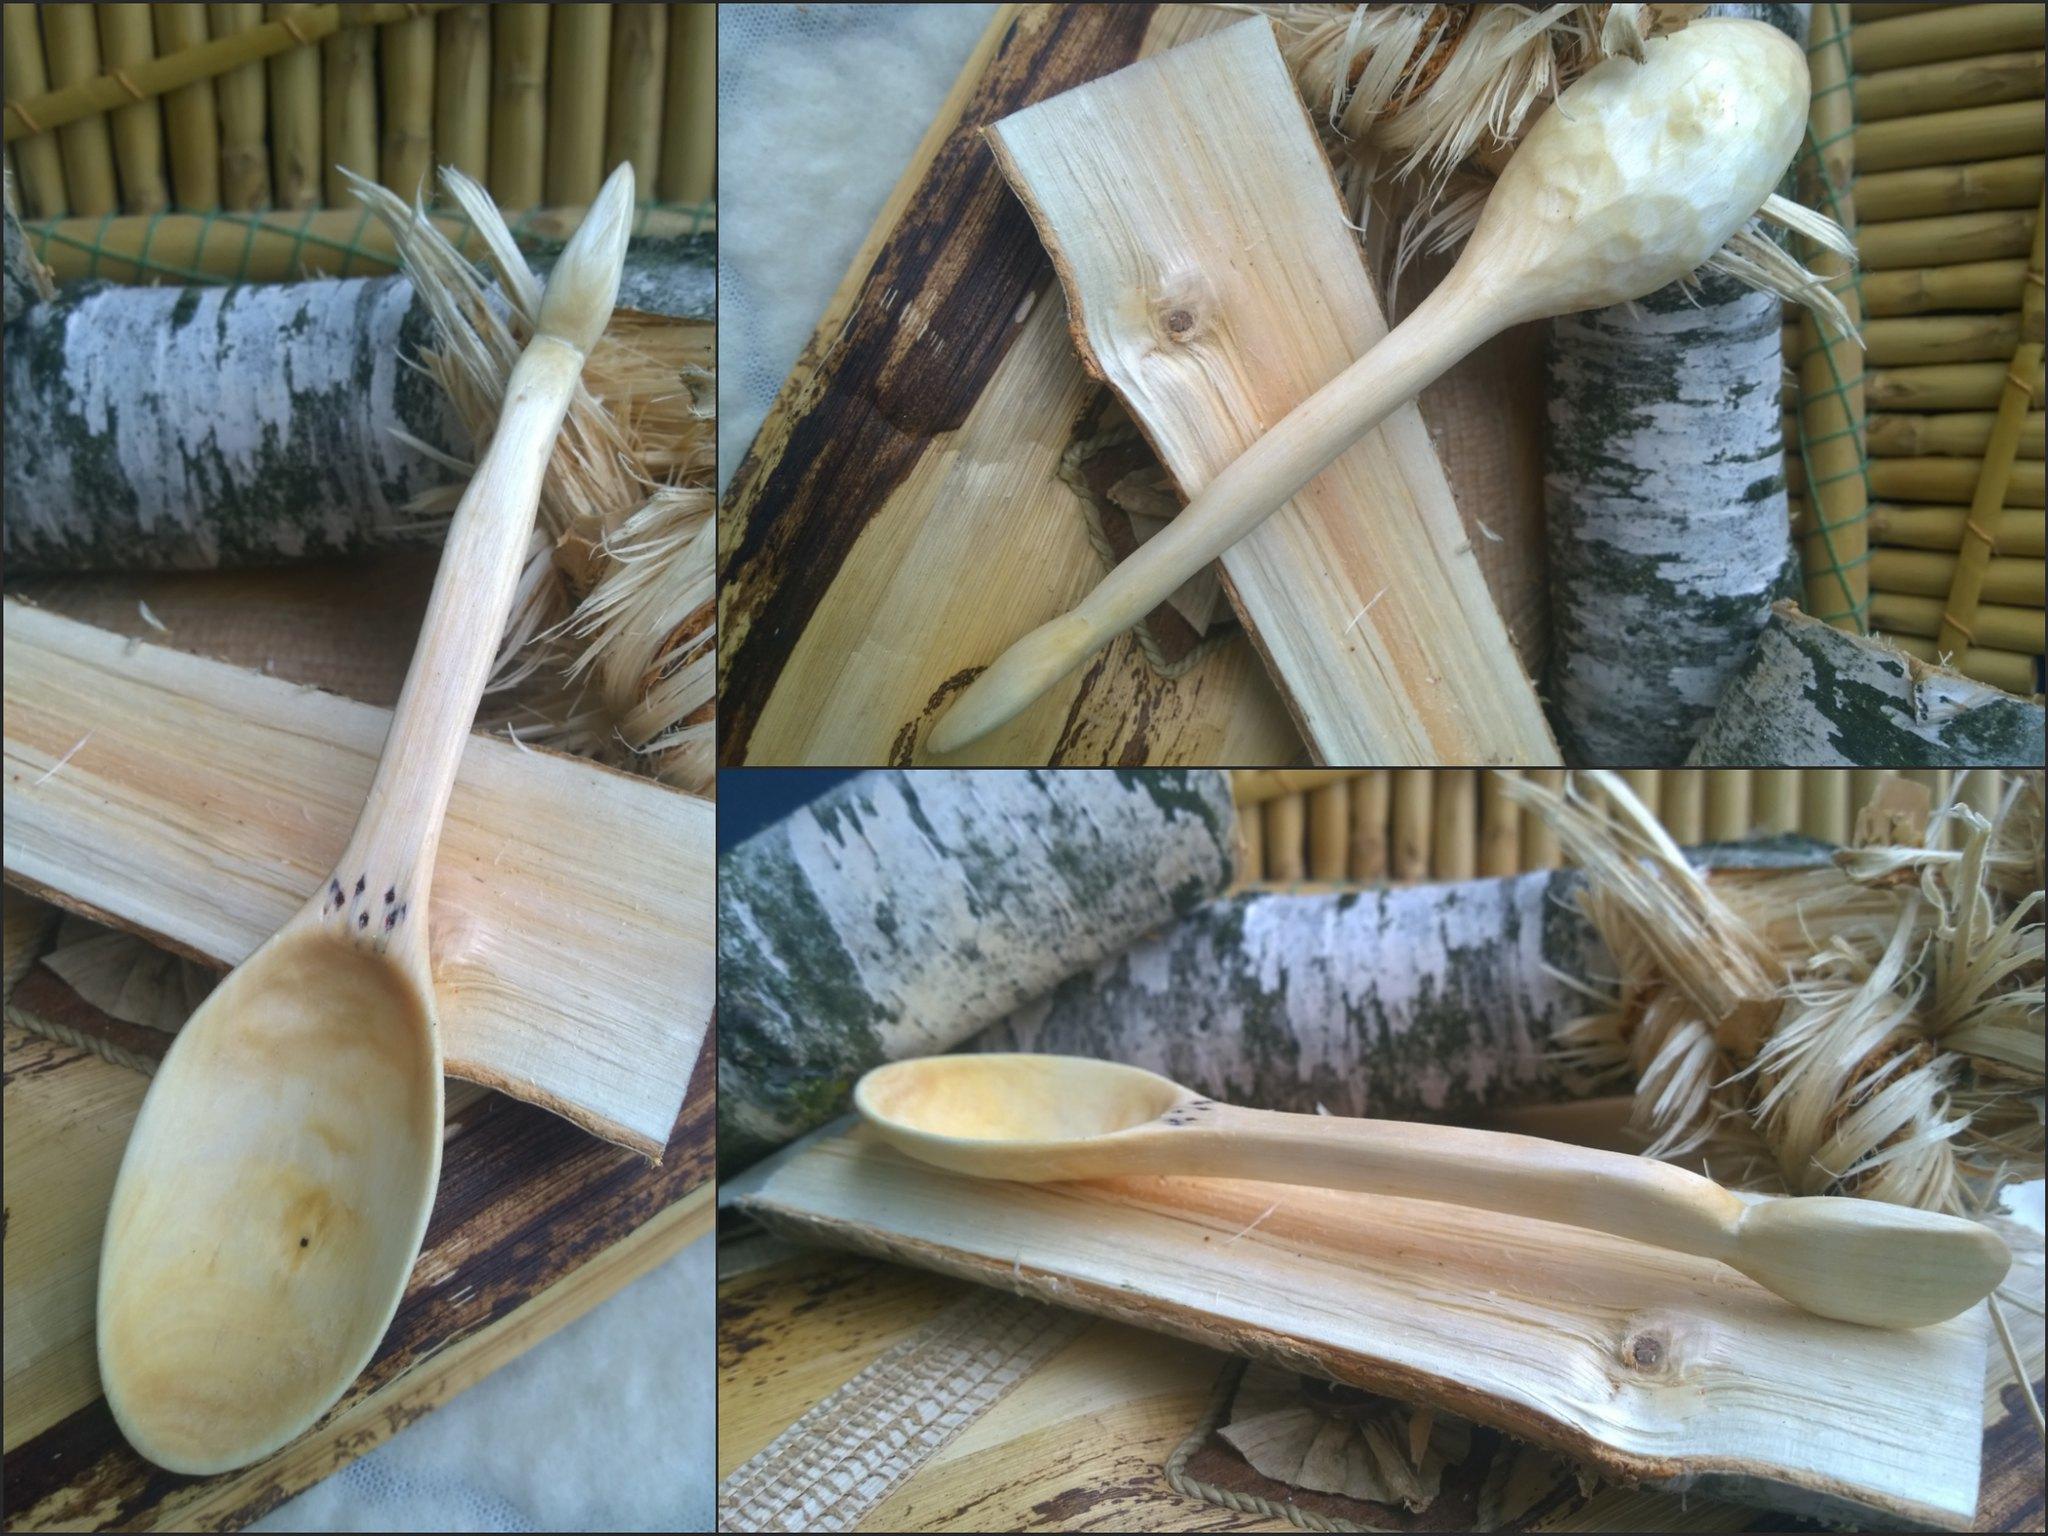 El spatula i žlica - Page 2 32273464183_28b4468e6f_k